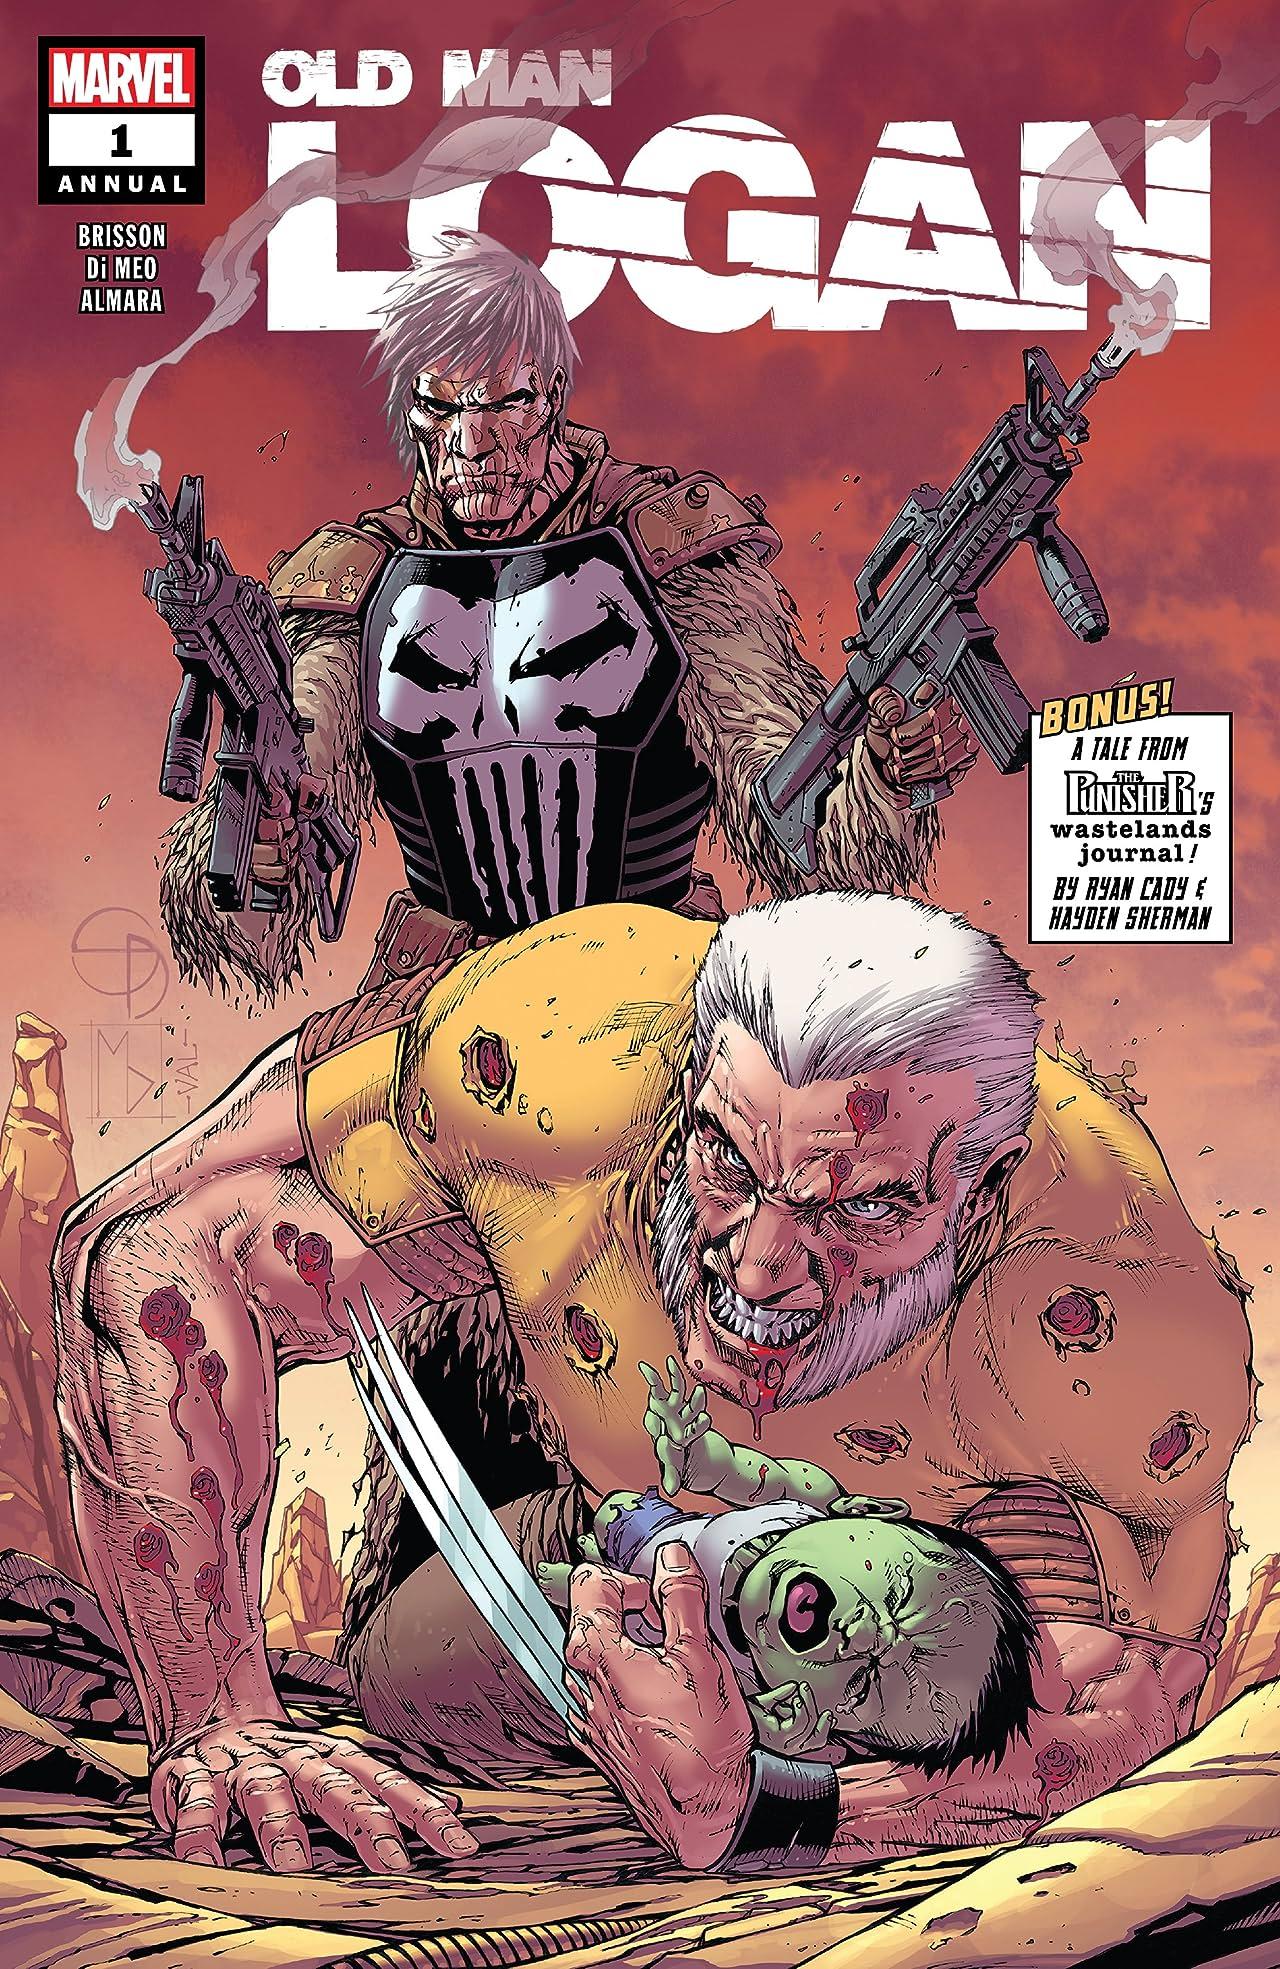 Old Man Logan (2016-2018) Annual #1